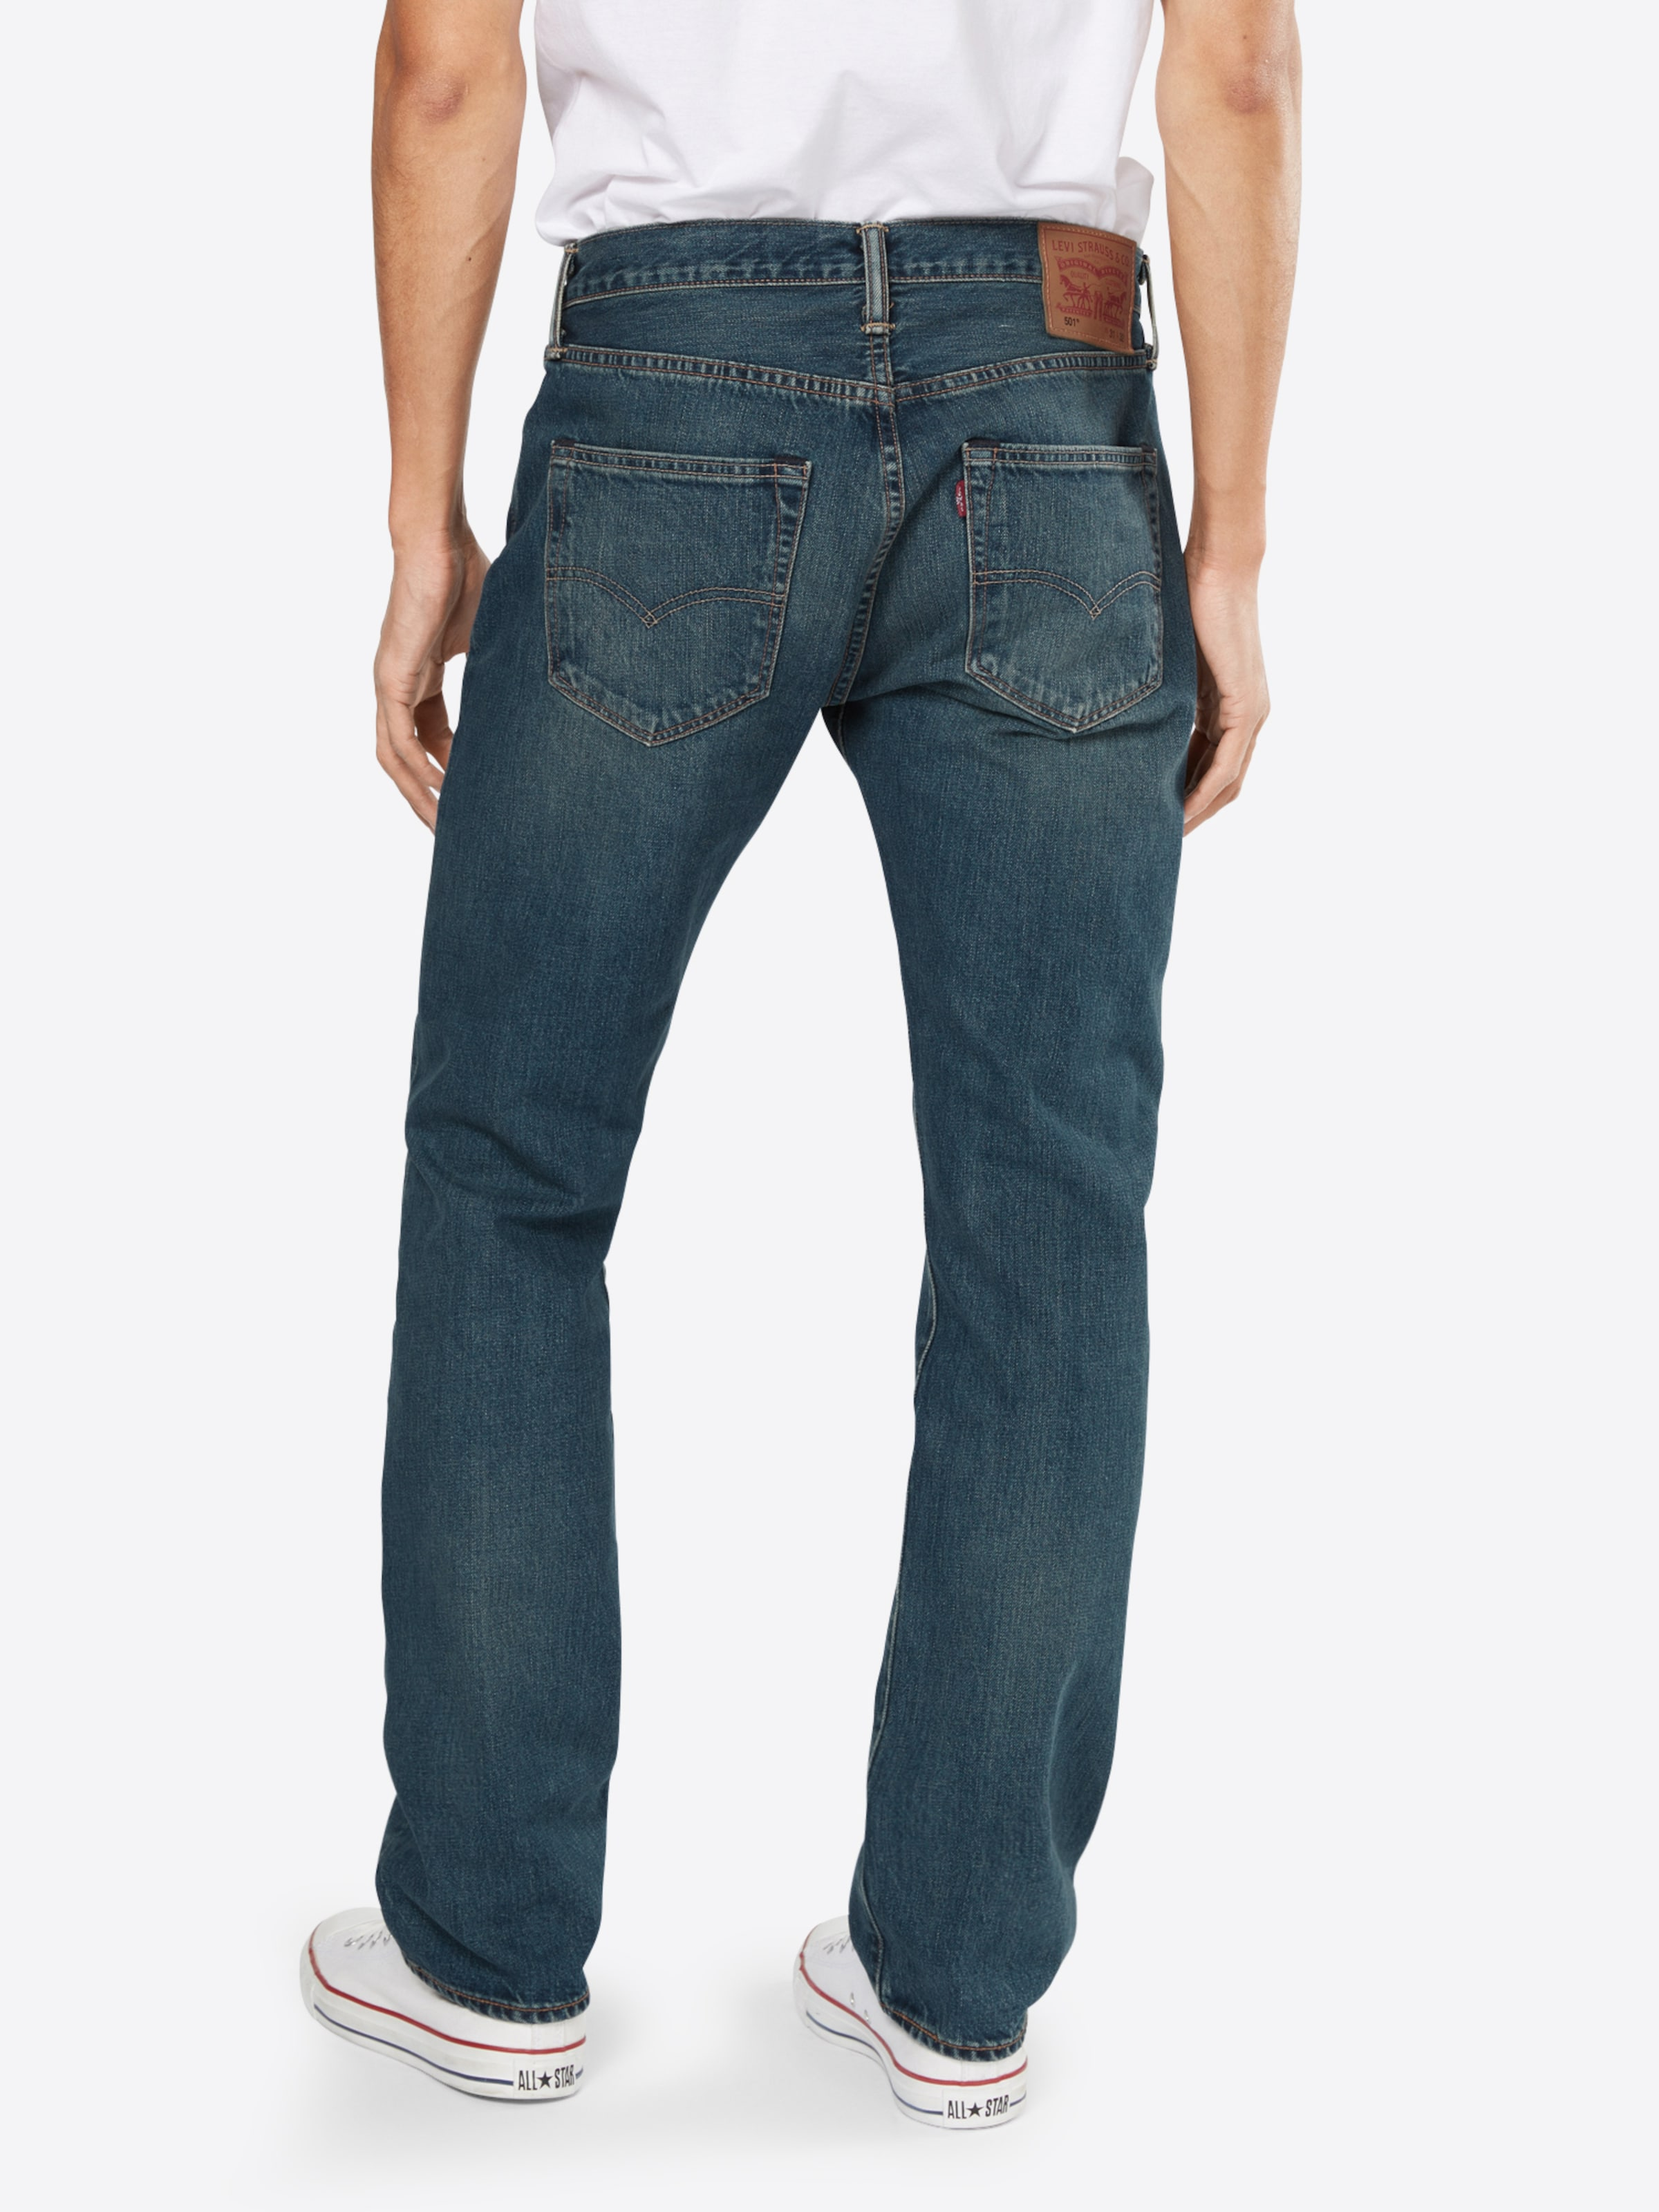 Denim Jeans Blue '501 Original Fit' In Levi's Ok8wXnN0P